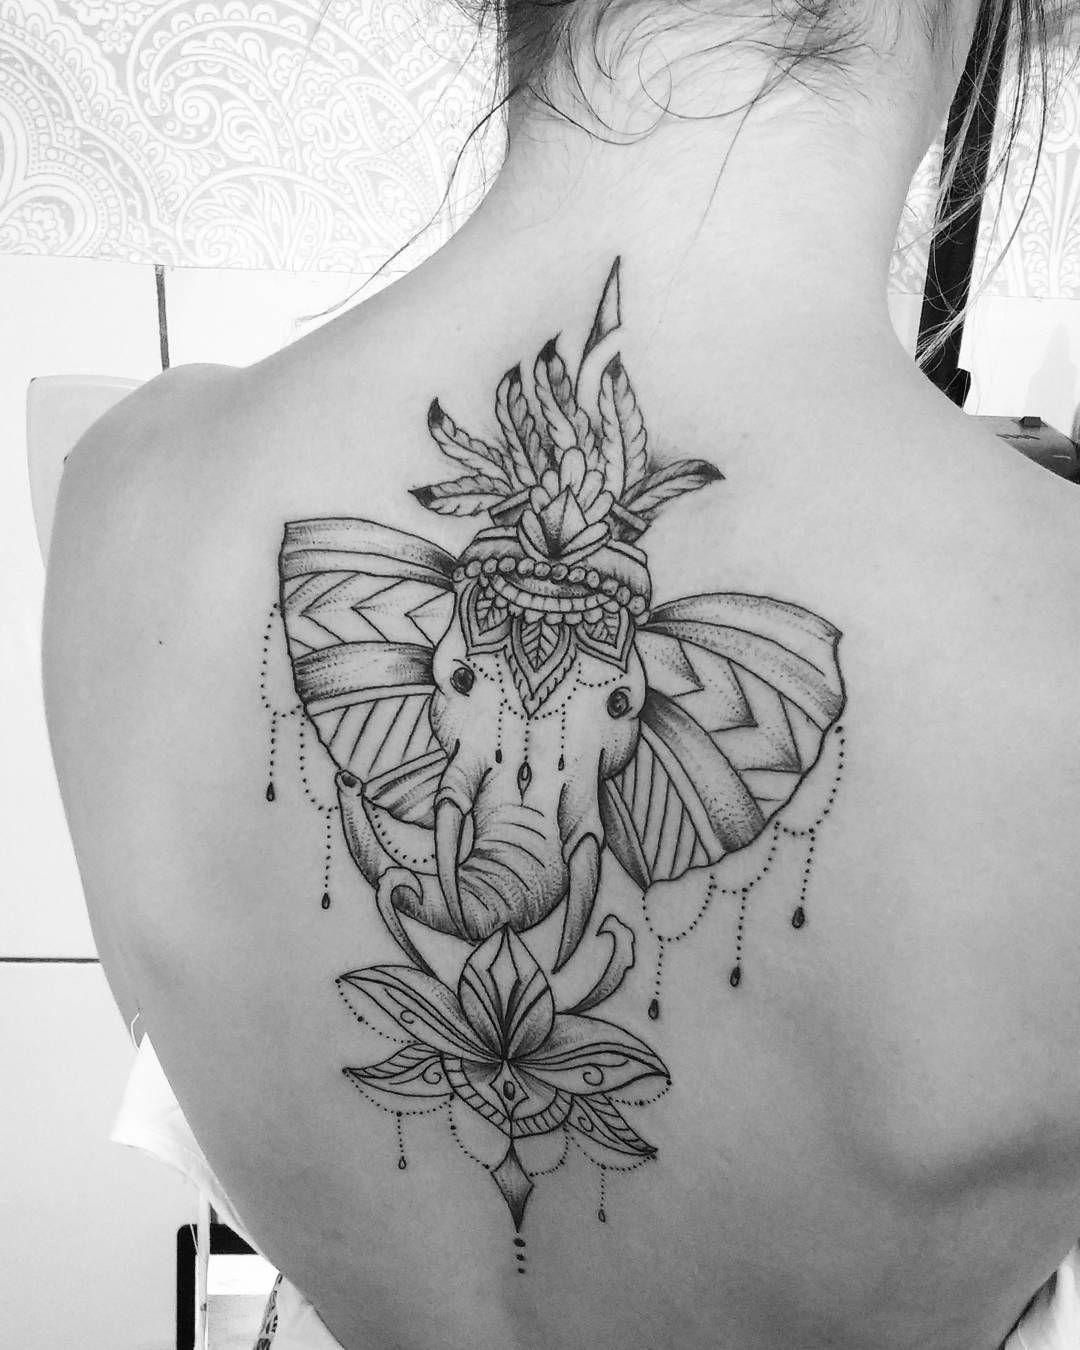 Elefante Y Flor De Loto Tattoos Tattoos Tattoo Designs Ink Art